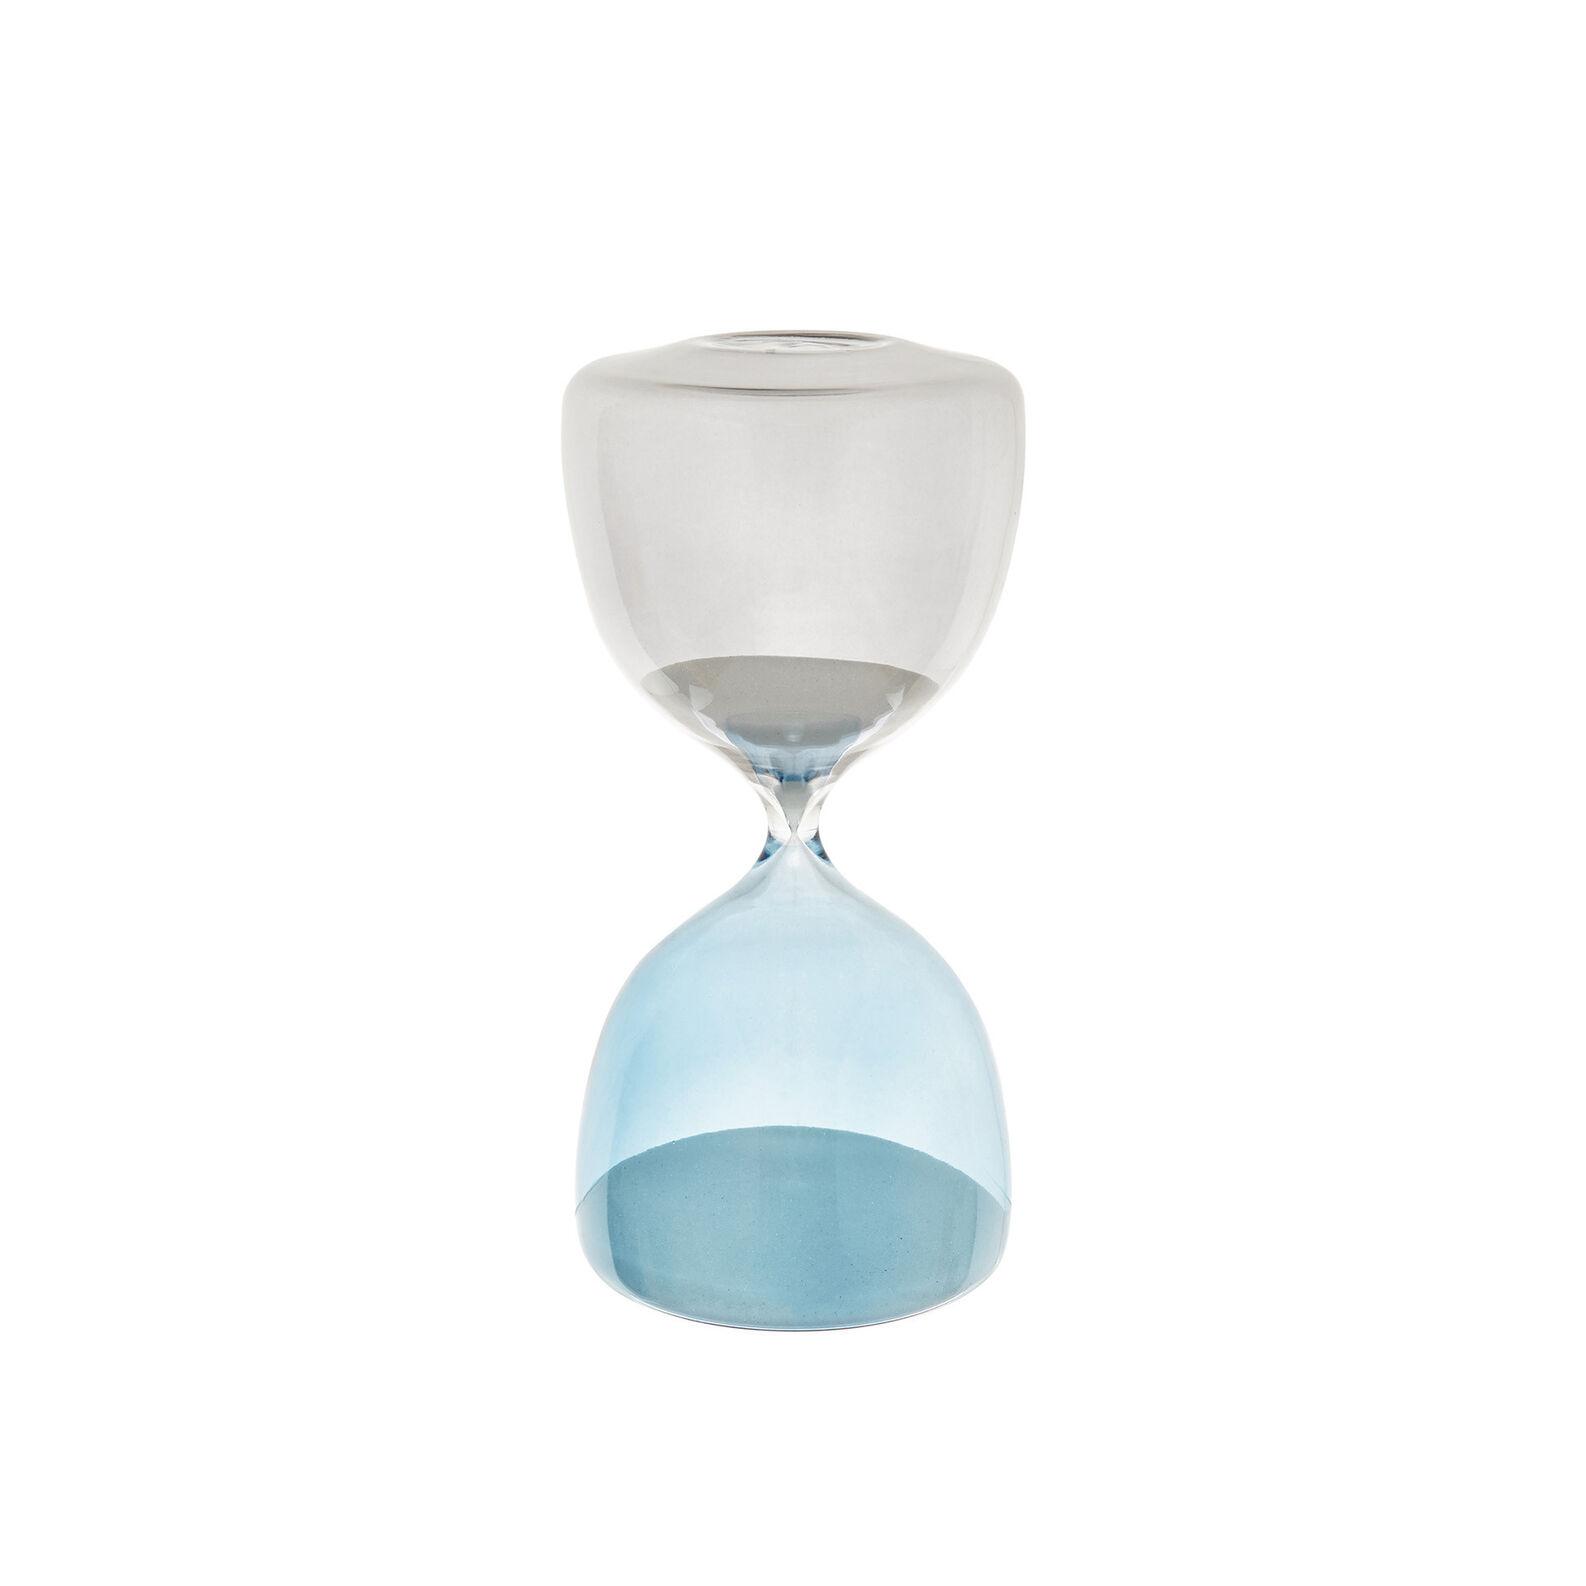 Coloured glass jewellery hourglass